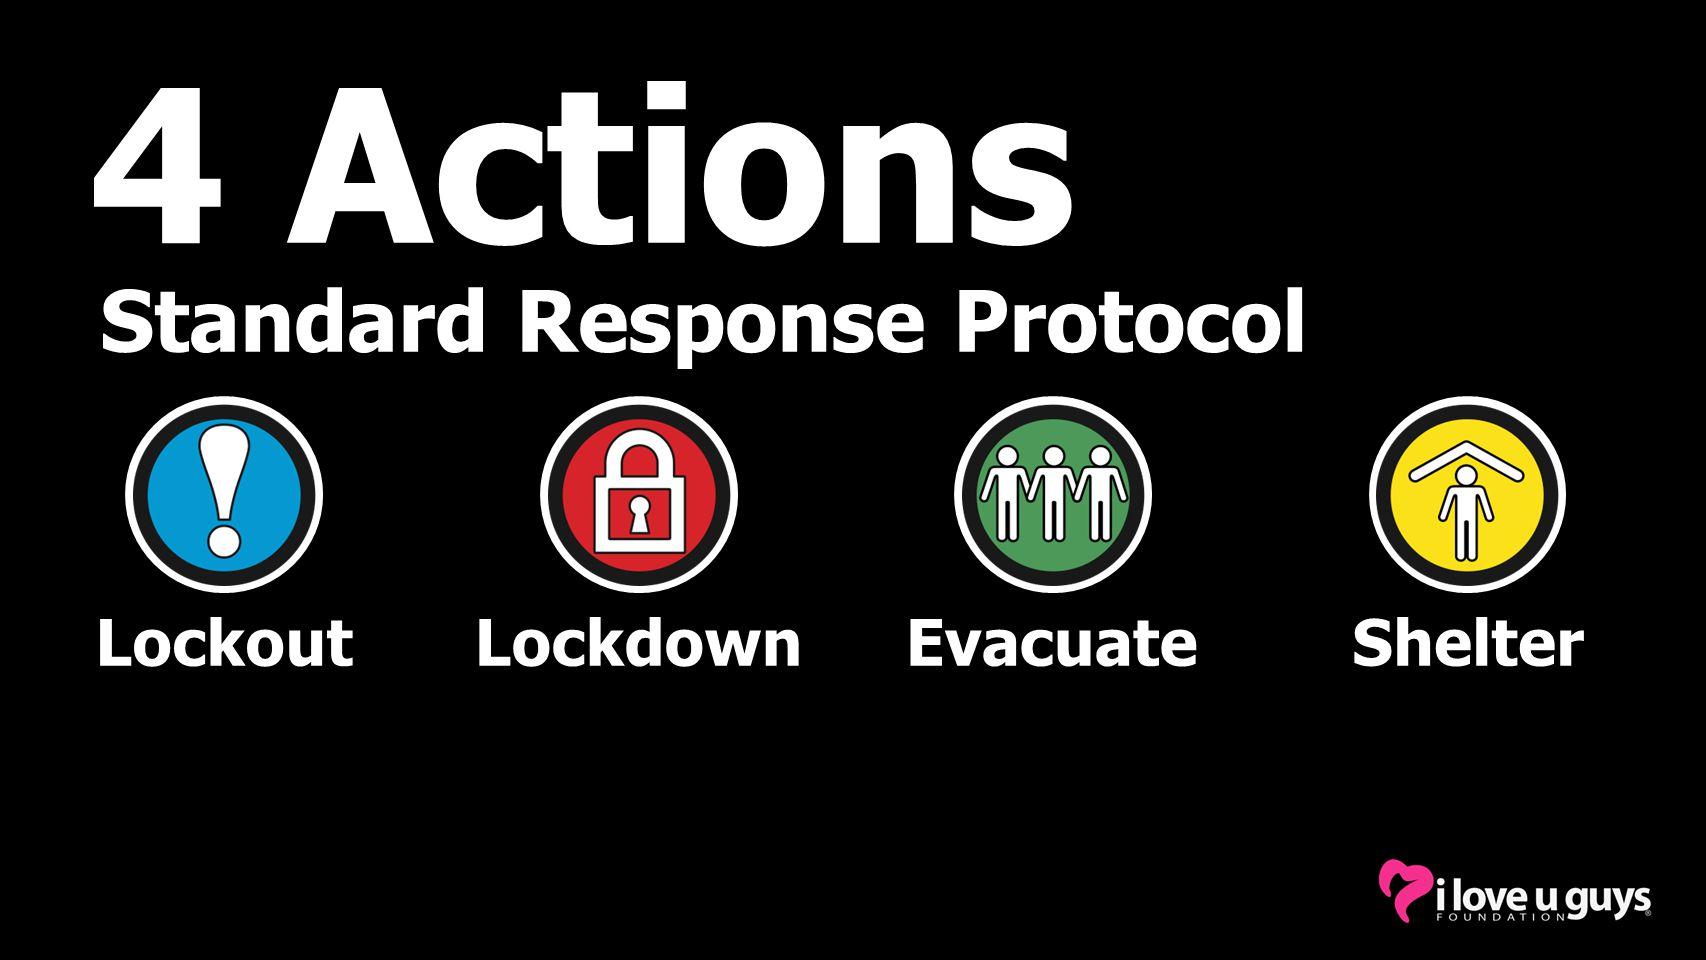 Standard Response Protocol 4 Actions LockoutLockdownEvacuateShelter